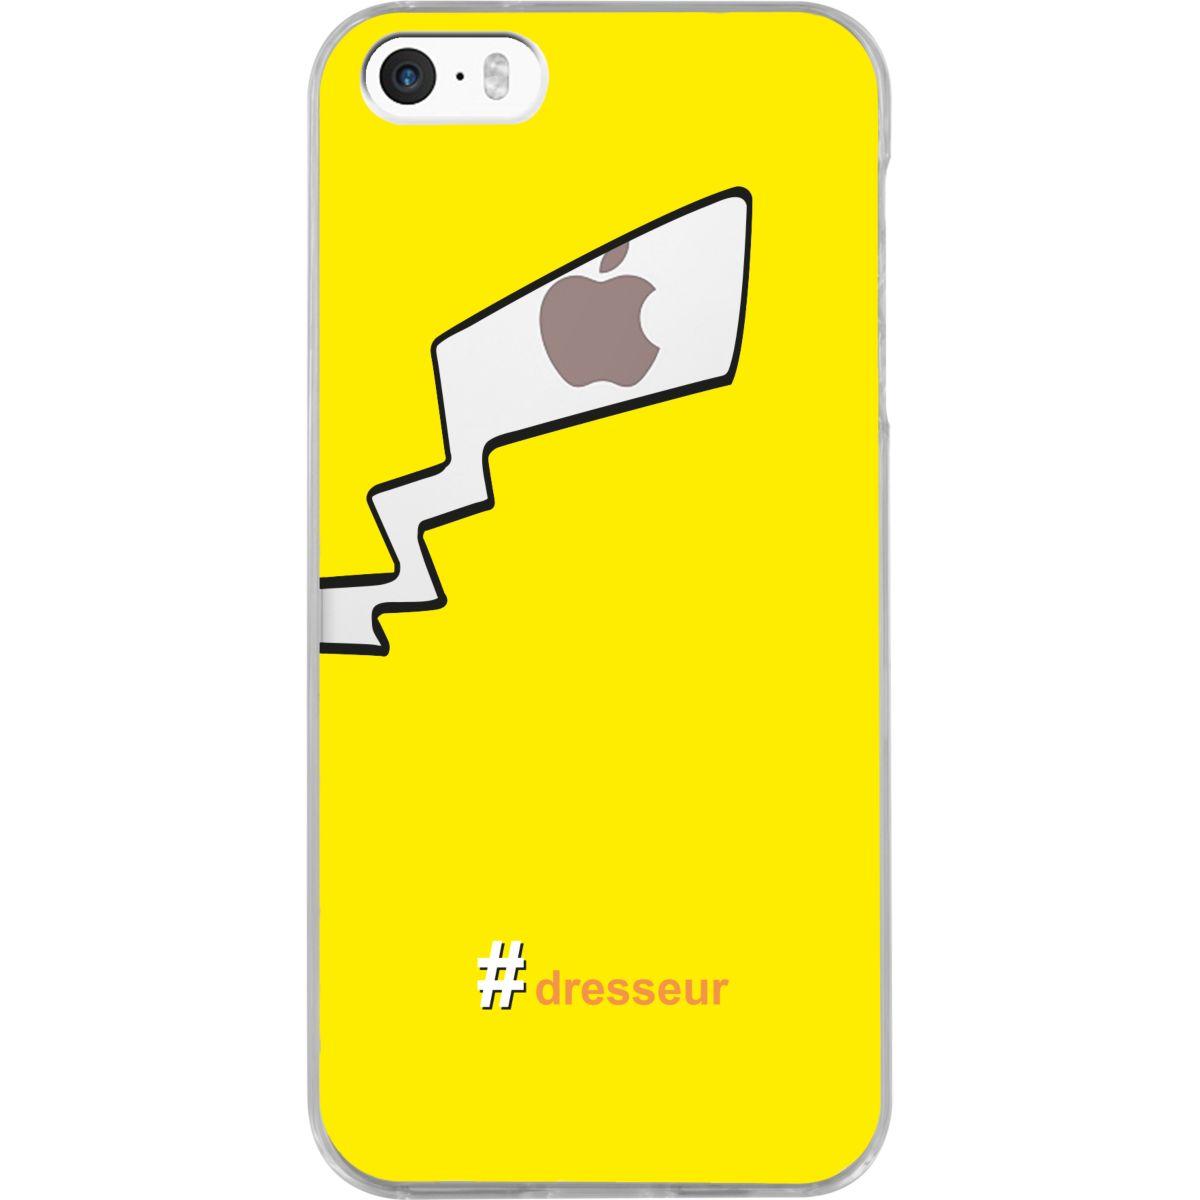 Coque BIGBEN iPhone 5S/SE #Dresseur Pikachu jaune